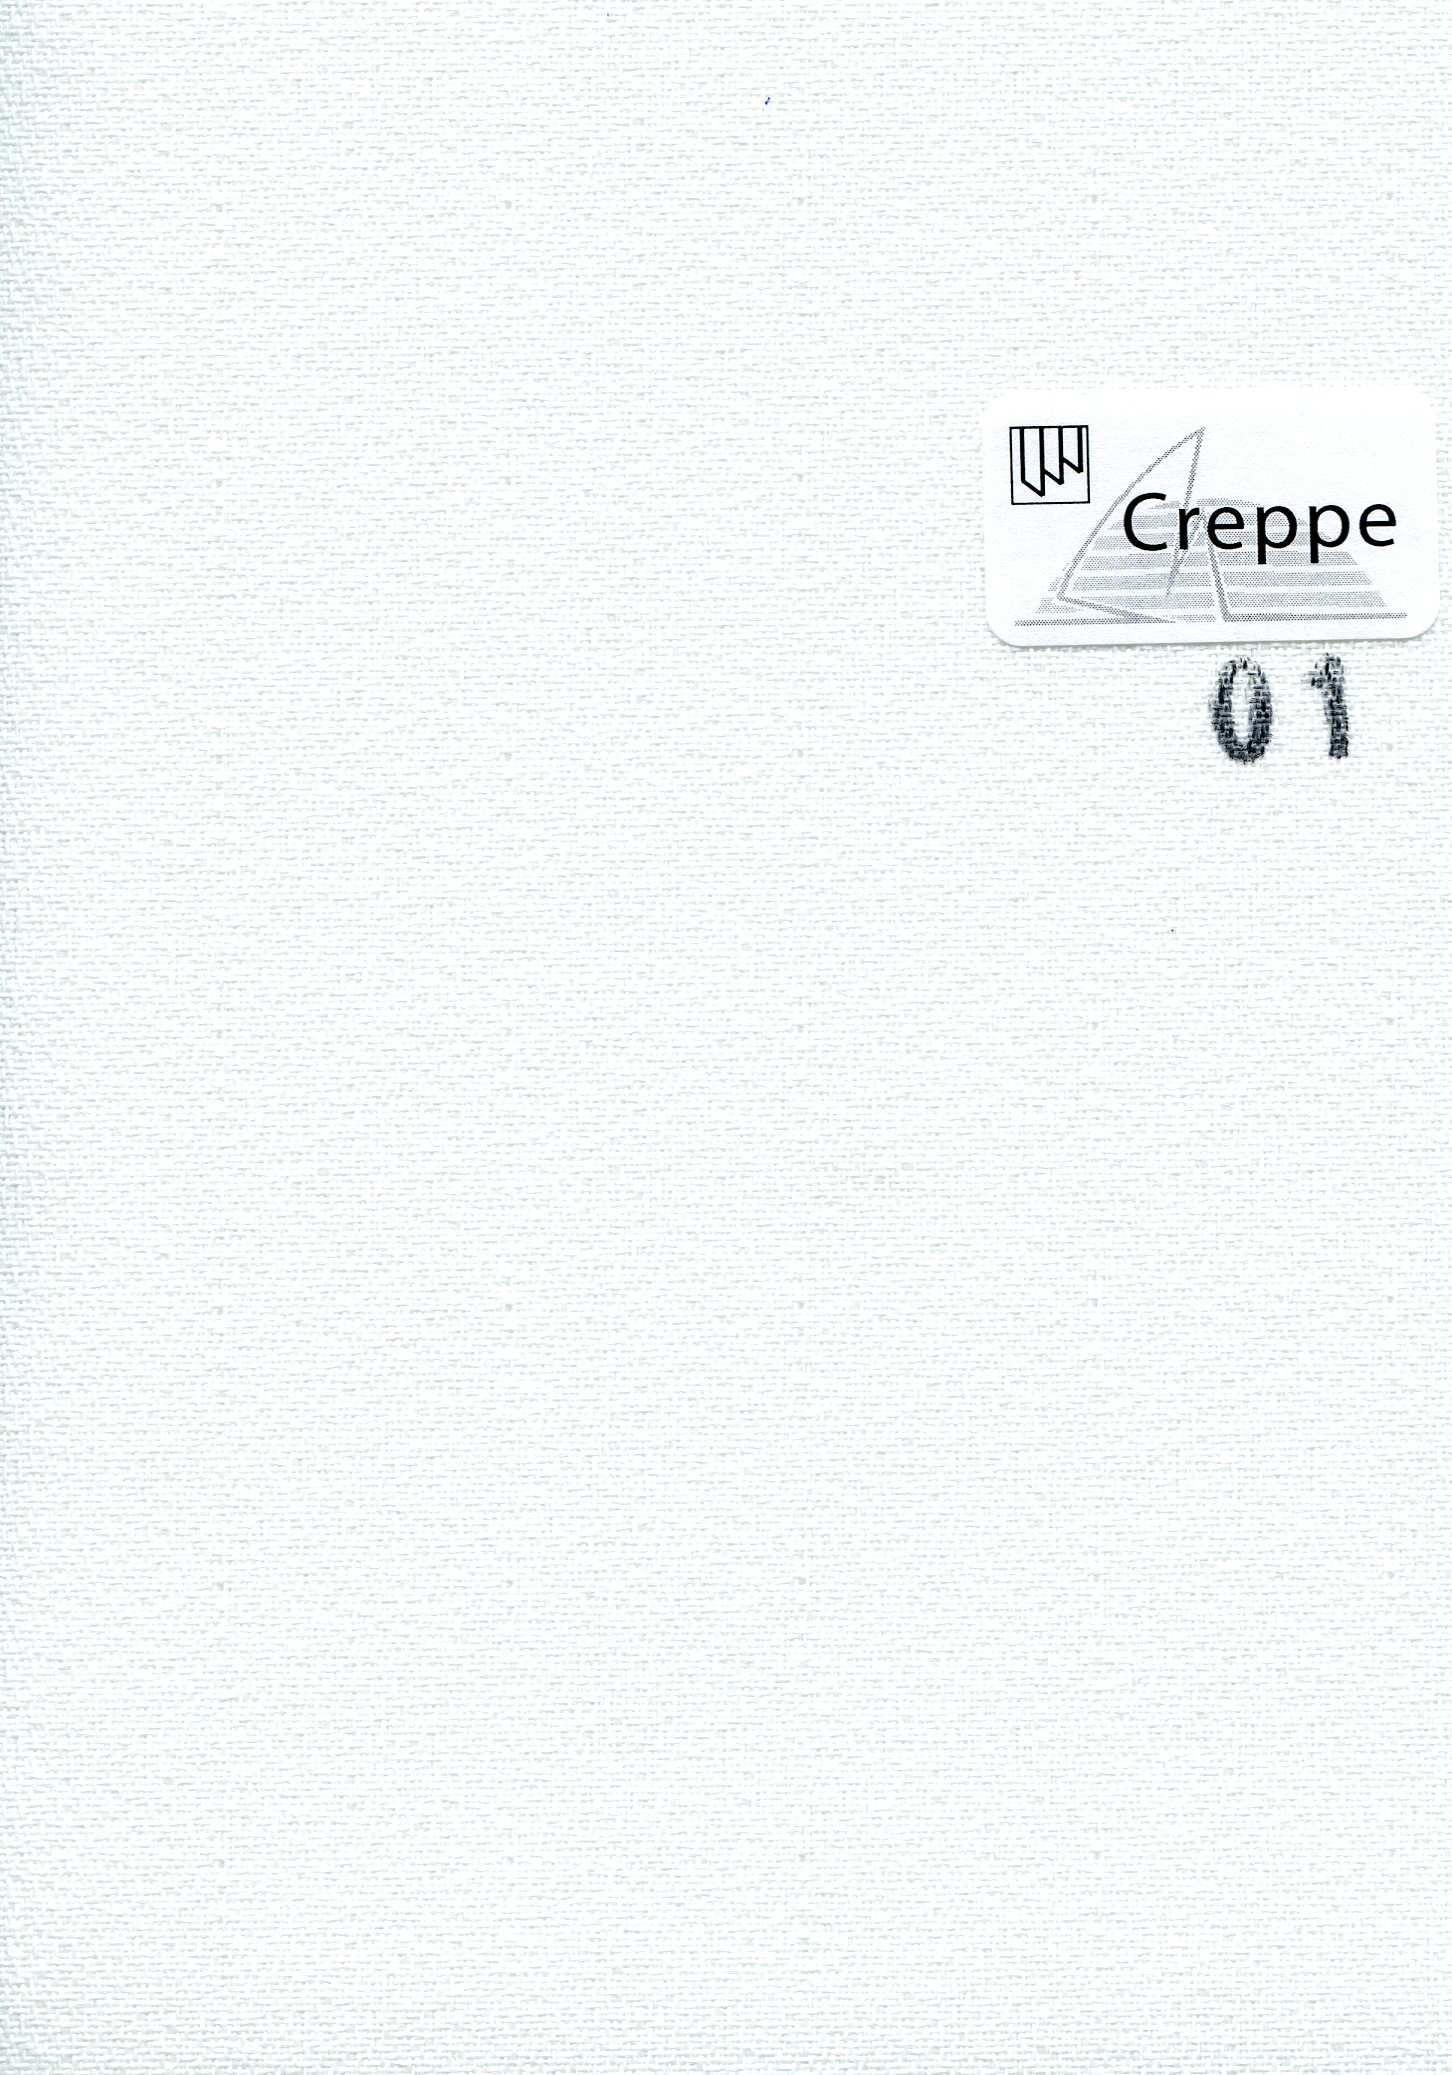 Creppe 01